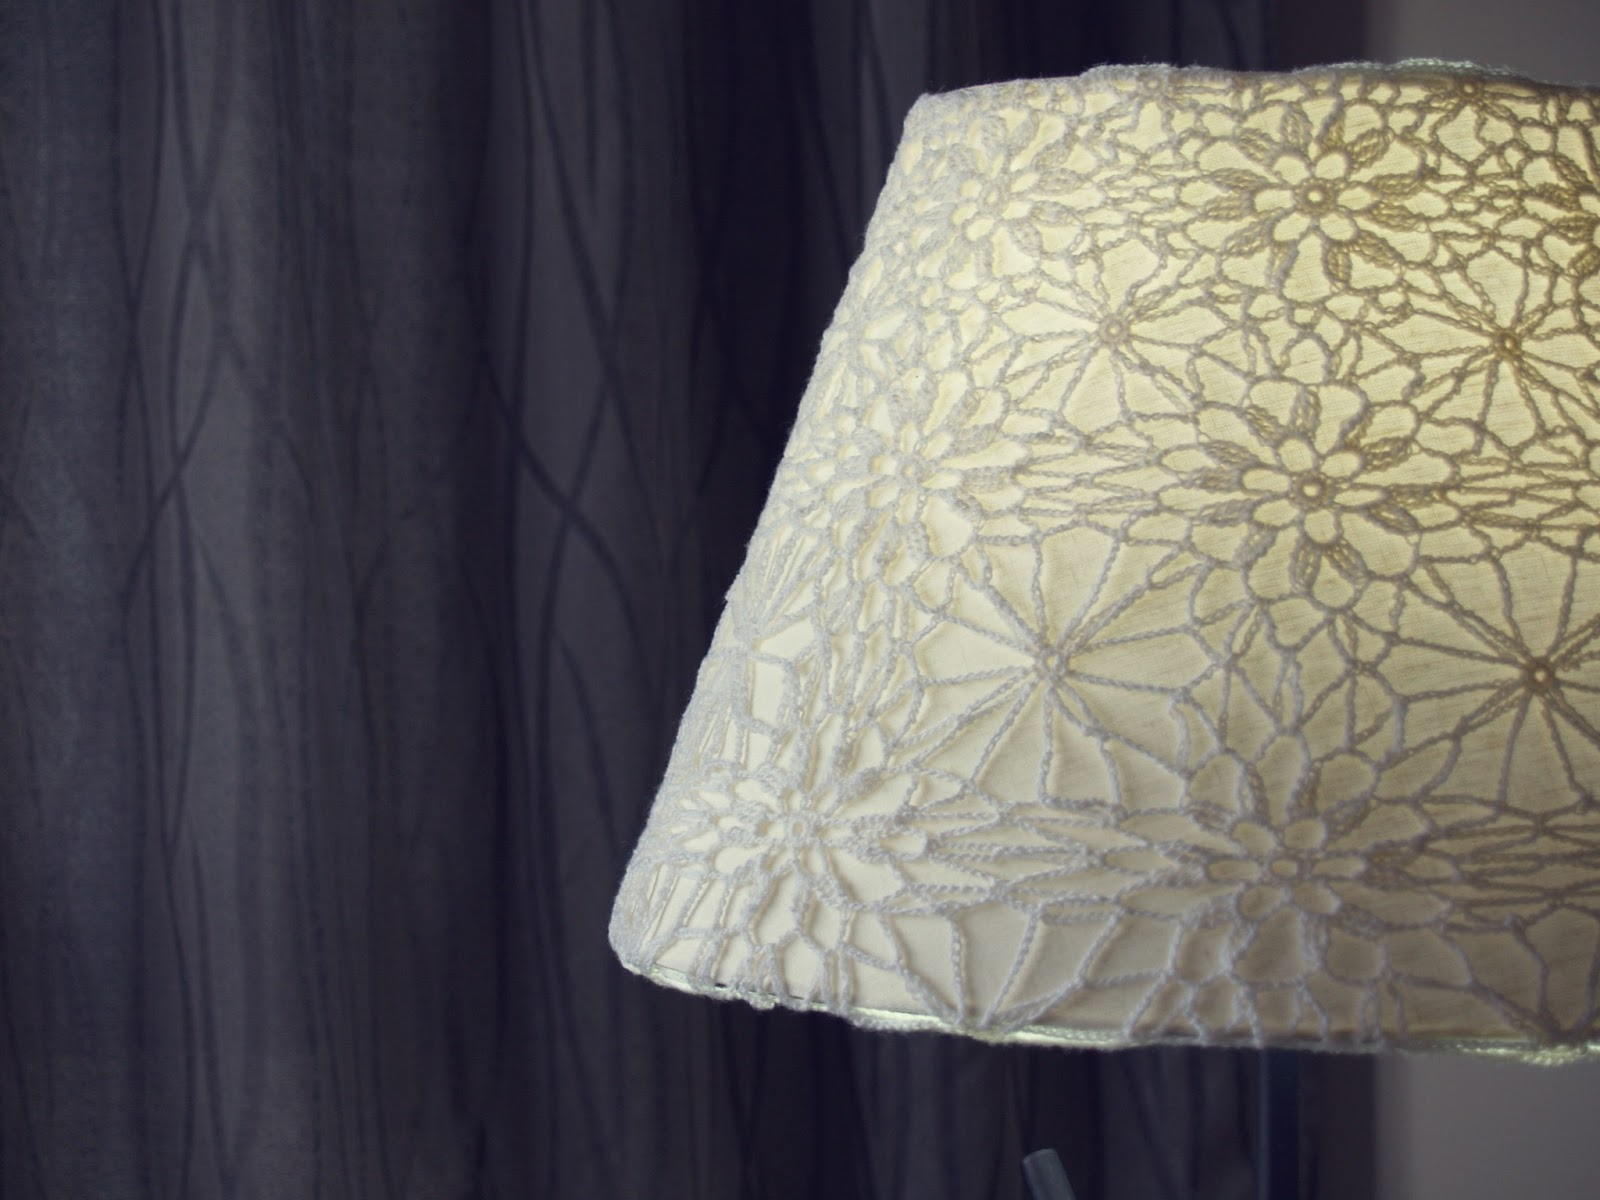 lampadario stoffa : Howsanne Handmade Crochet : Crochet Lampshade